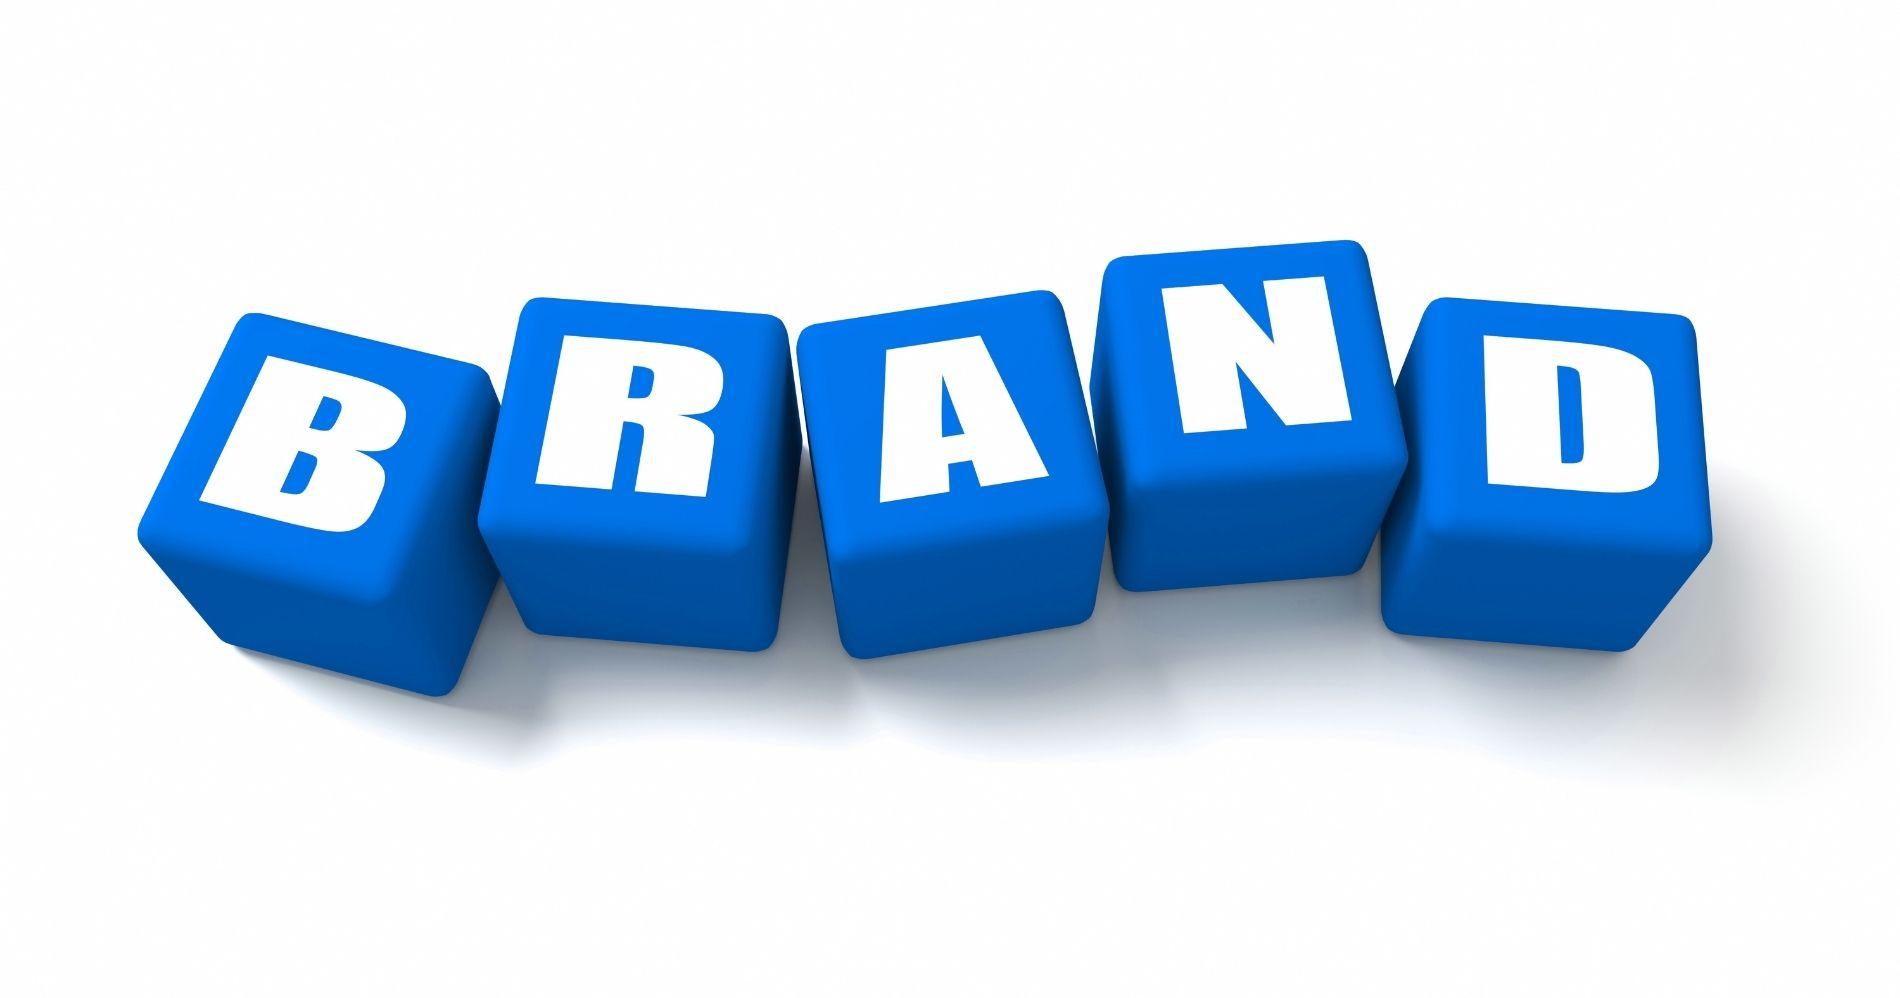 Brand - Canva